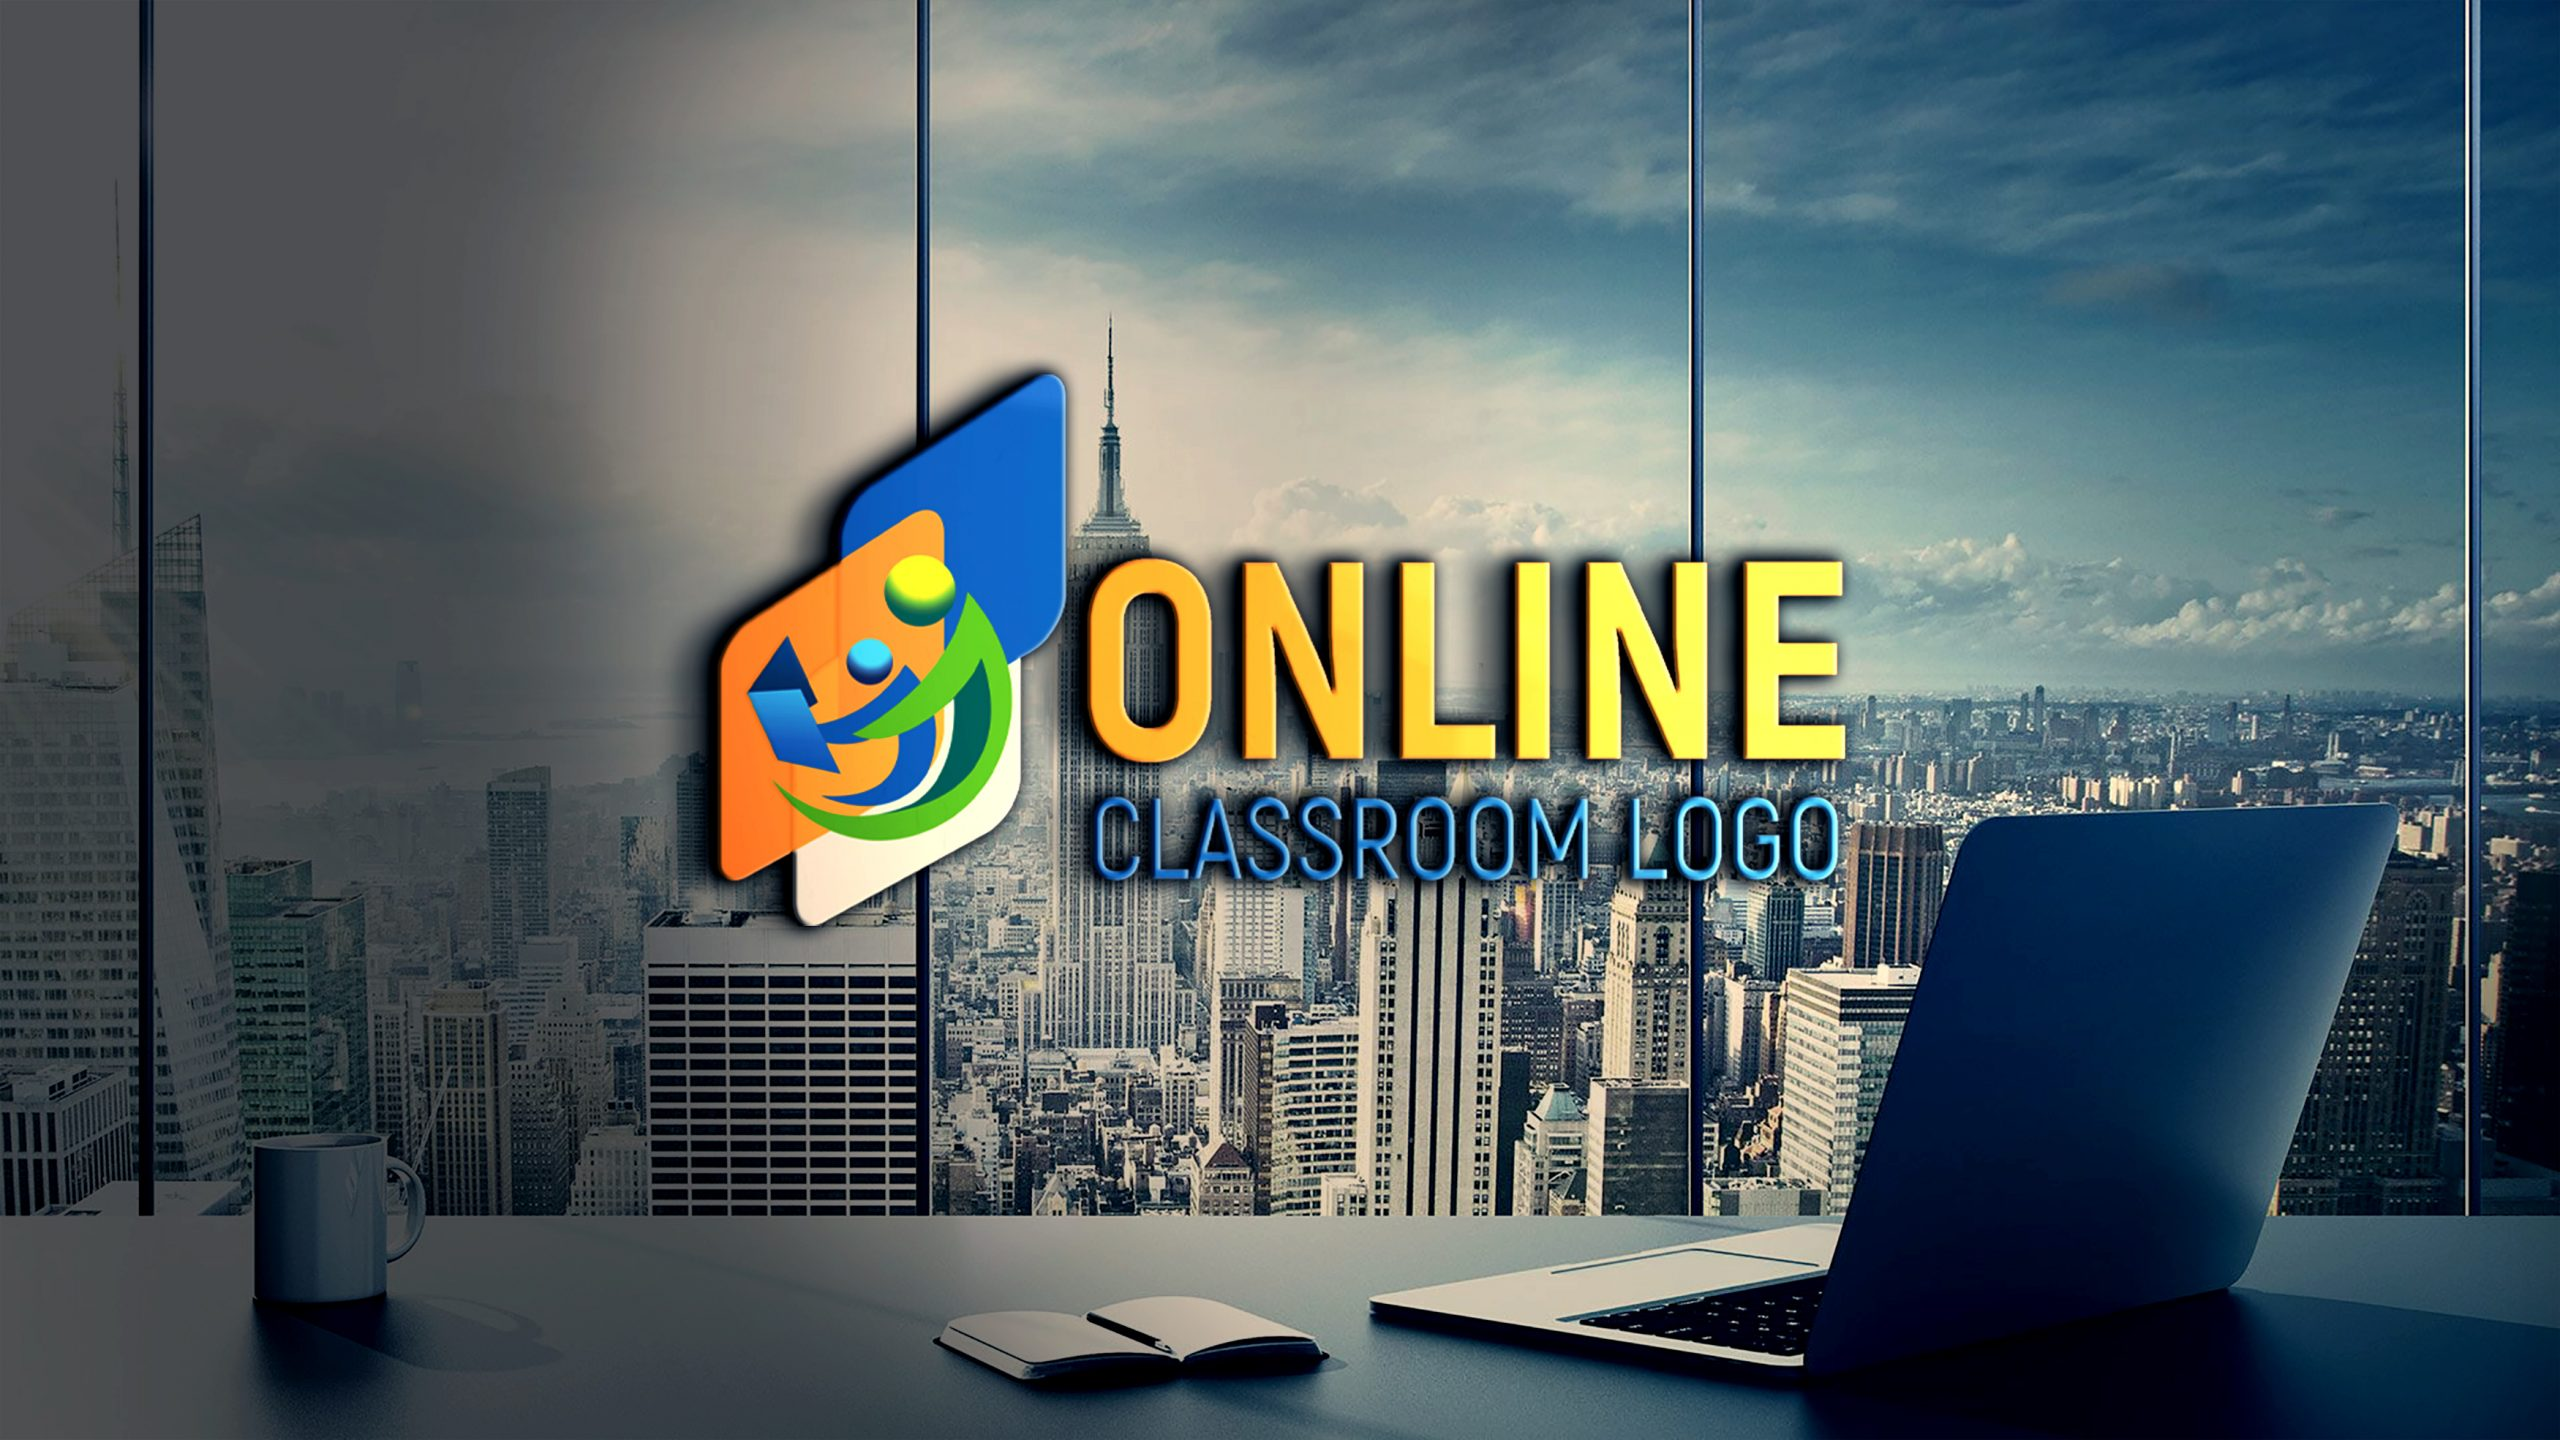 Free Online Class Logo Template on Transparent Glass